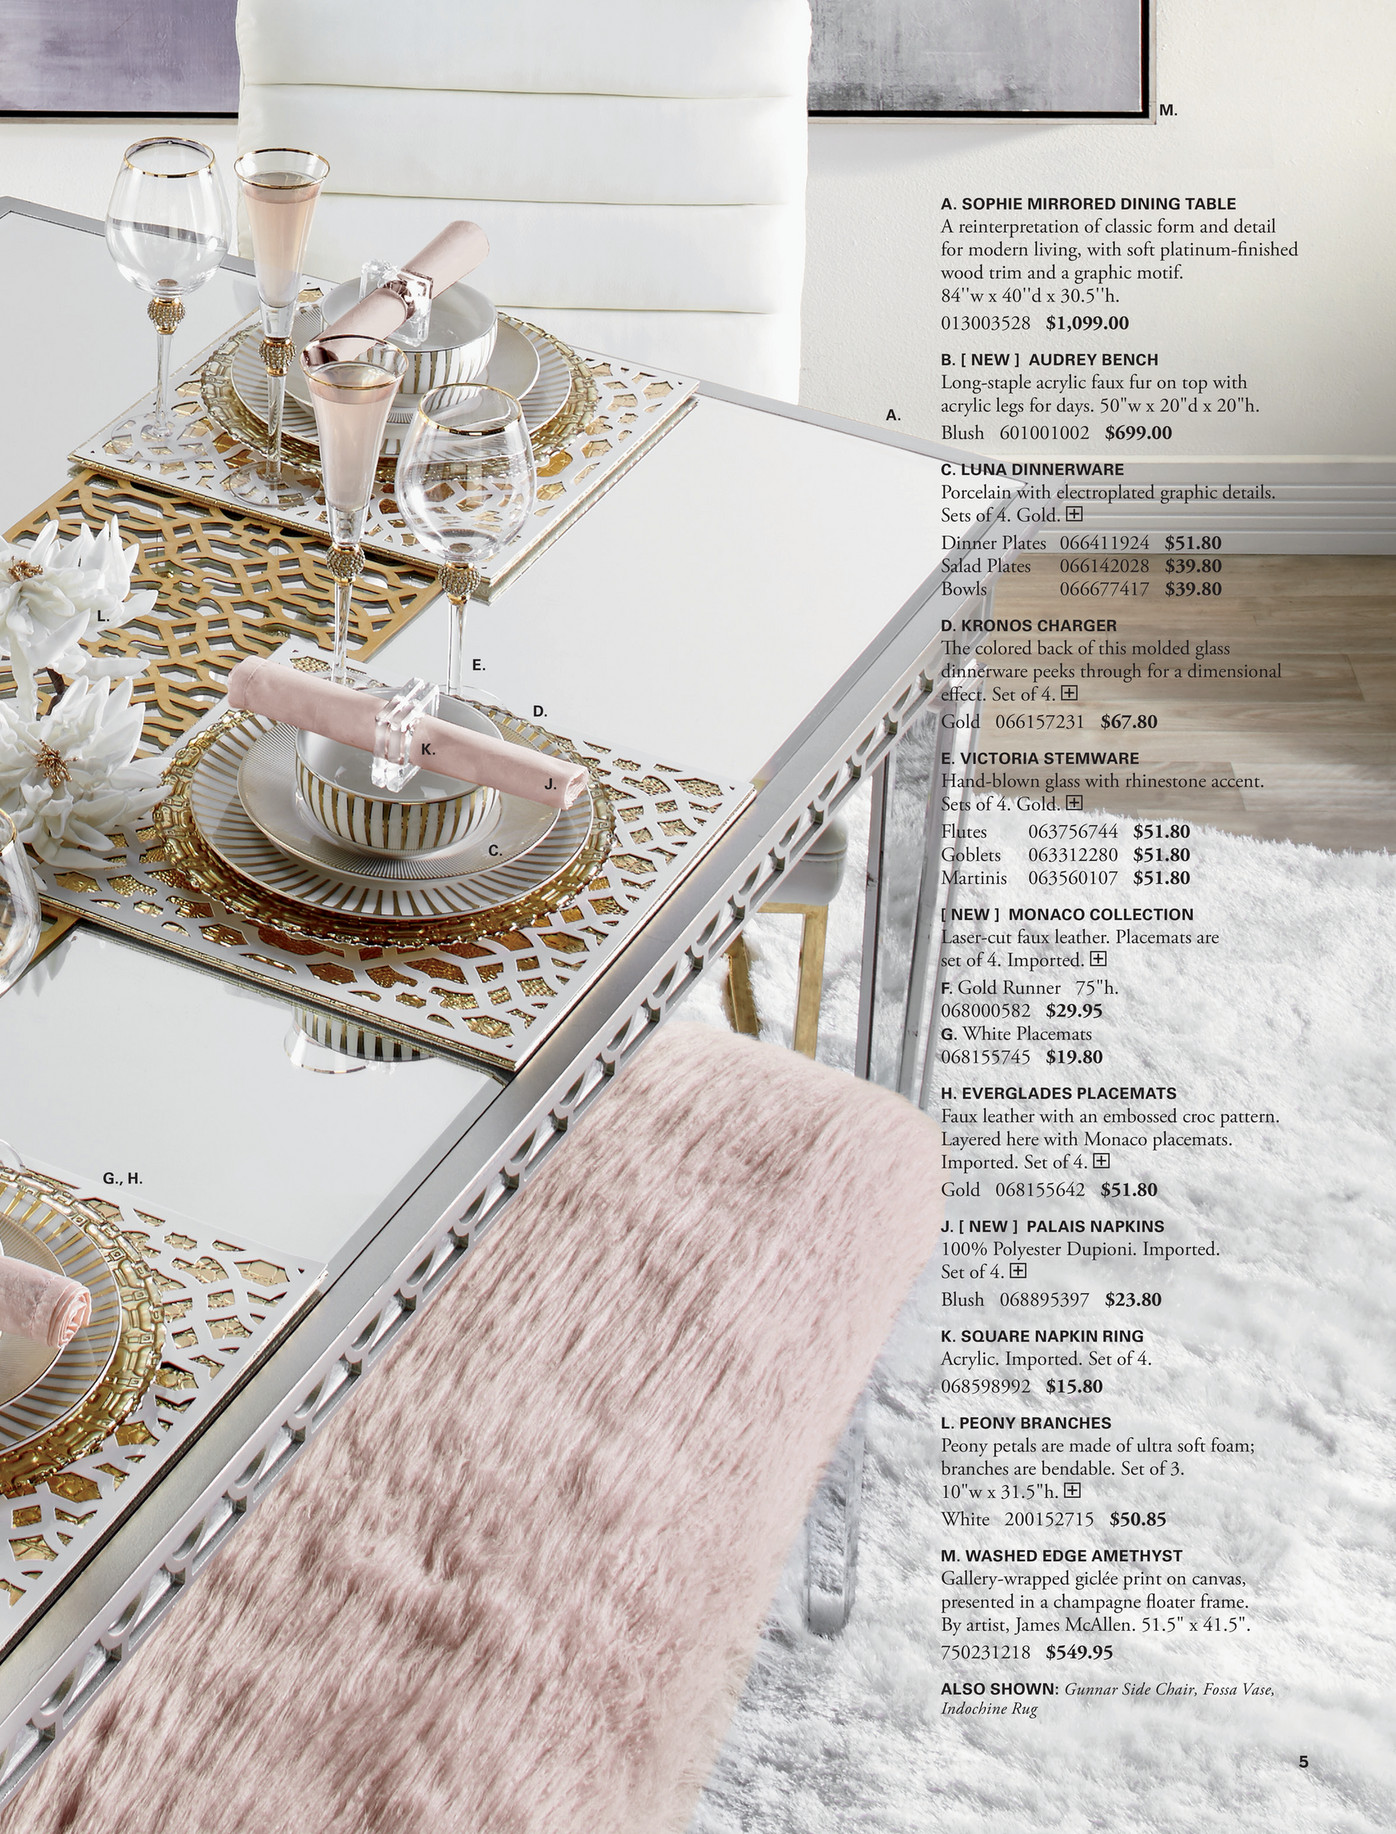 Astounding Z Gallerie Color Full Monaco Placemat Set Of 4 White Lamtechconsult Wood Chair Design Ideas Lamtechconsultcom